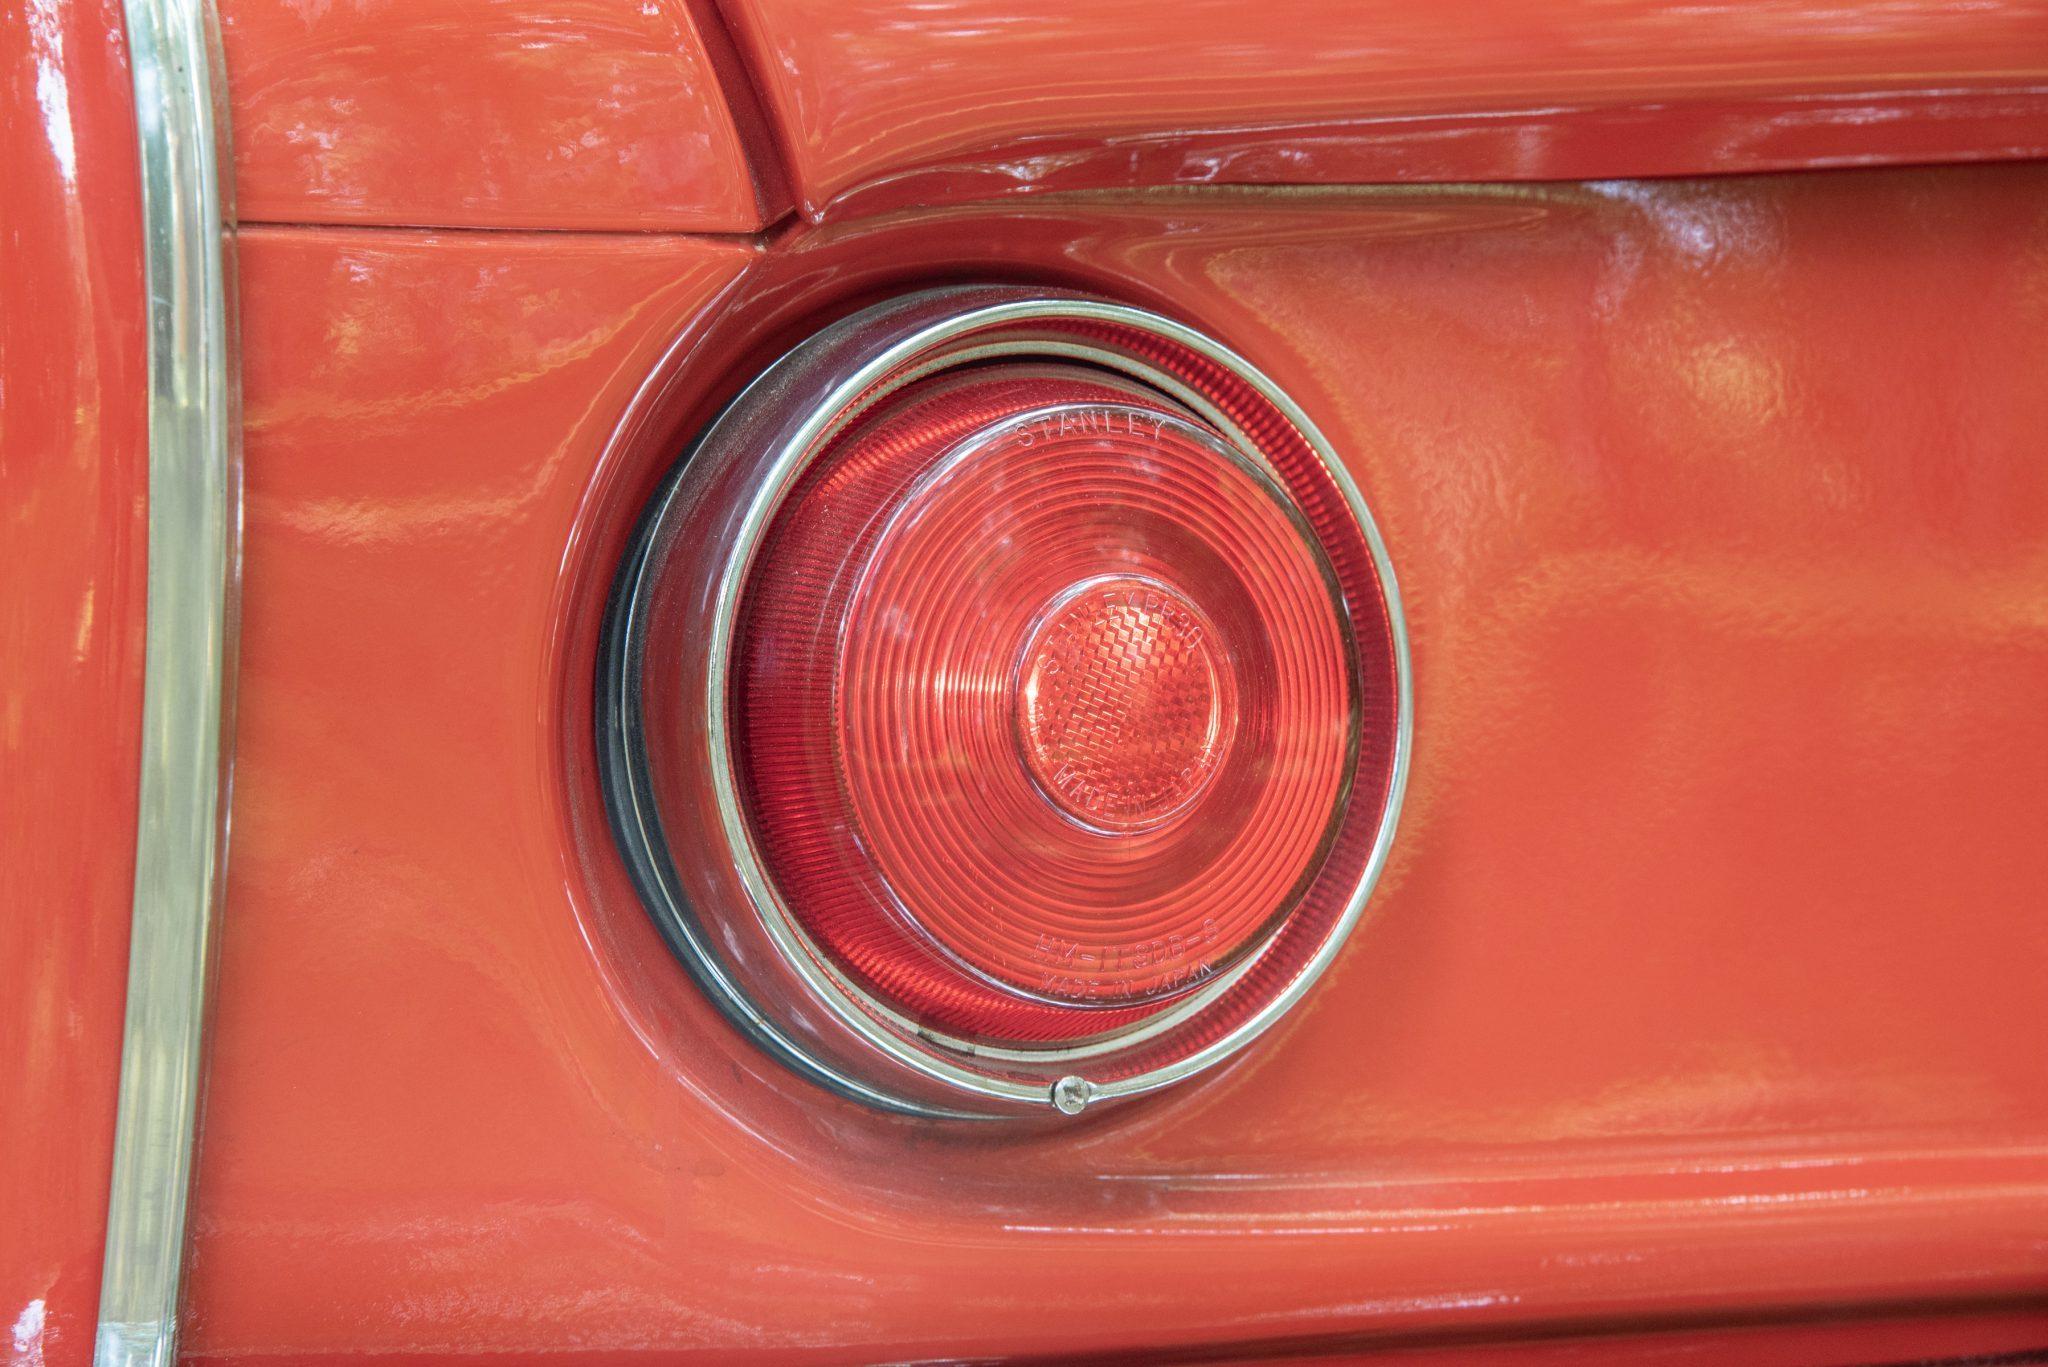 Honda S600 tailight detail